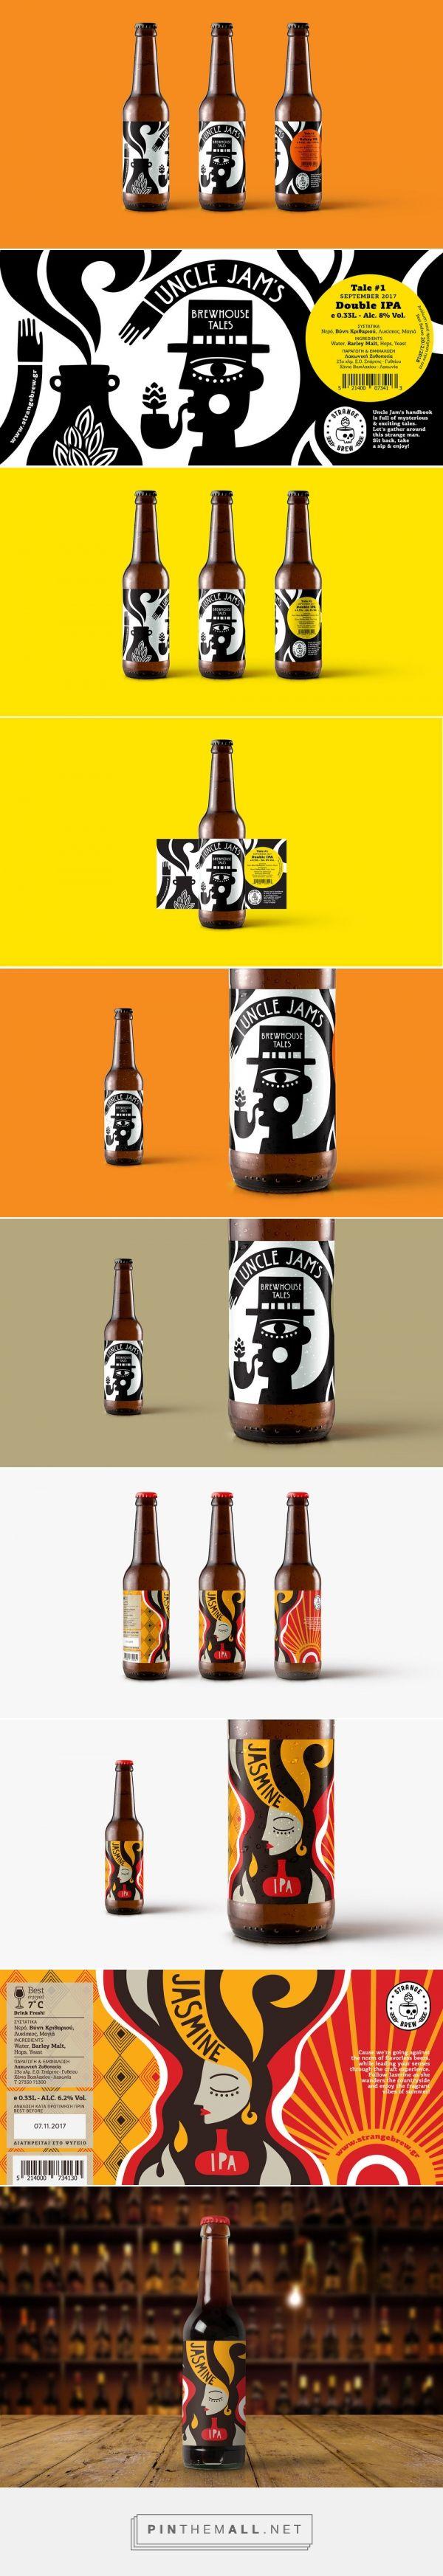 Strange Brew / beer packaging by polkadot design